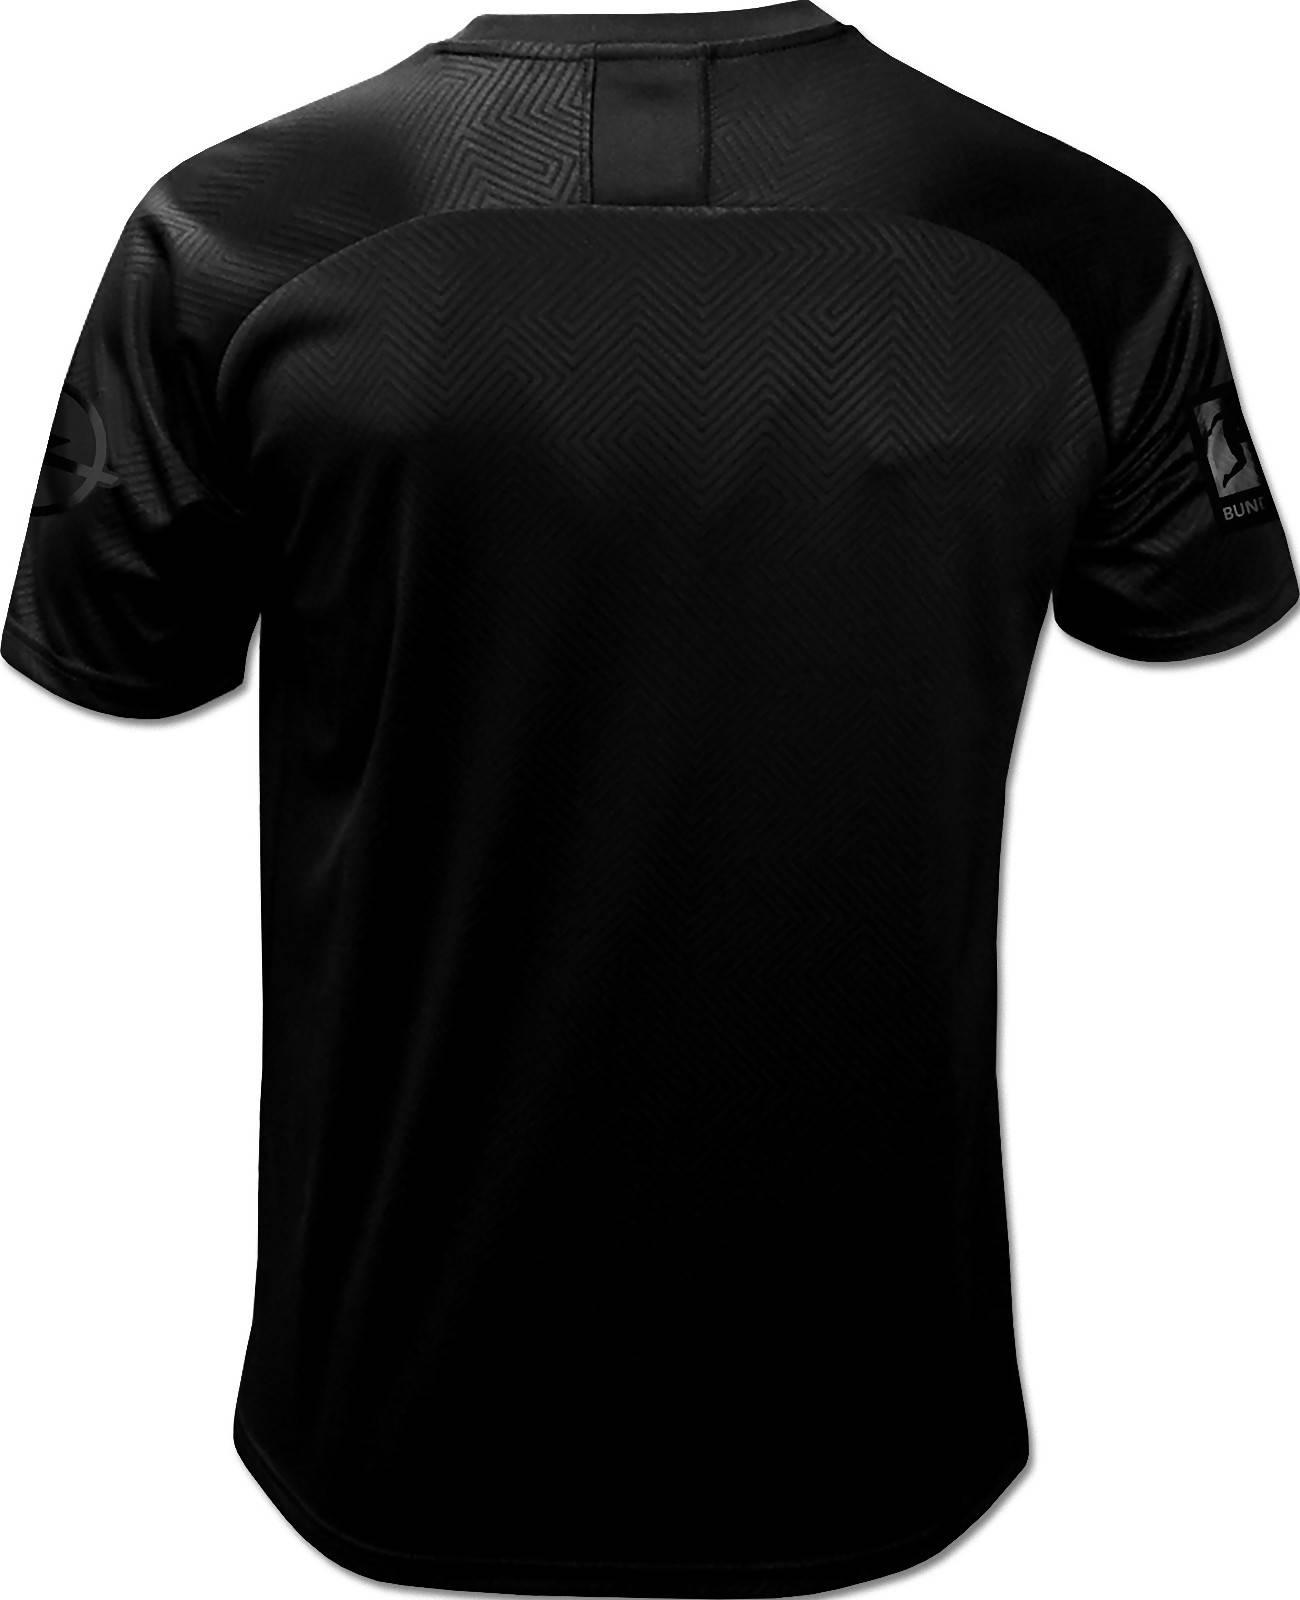 Borussia Dortmund 110th Anniversary Shirt